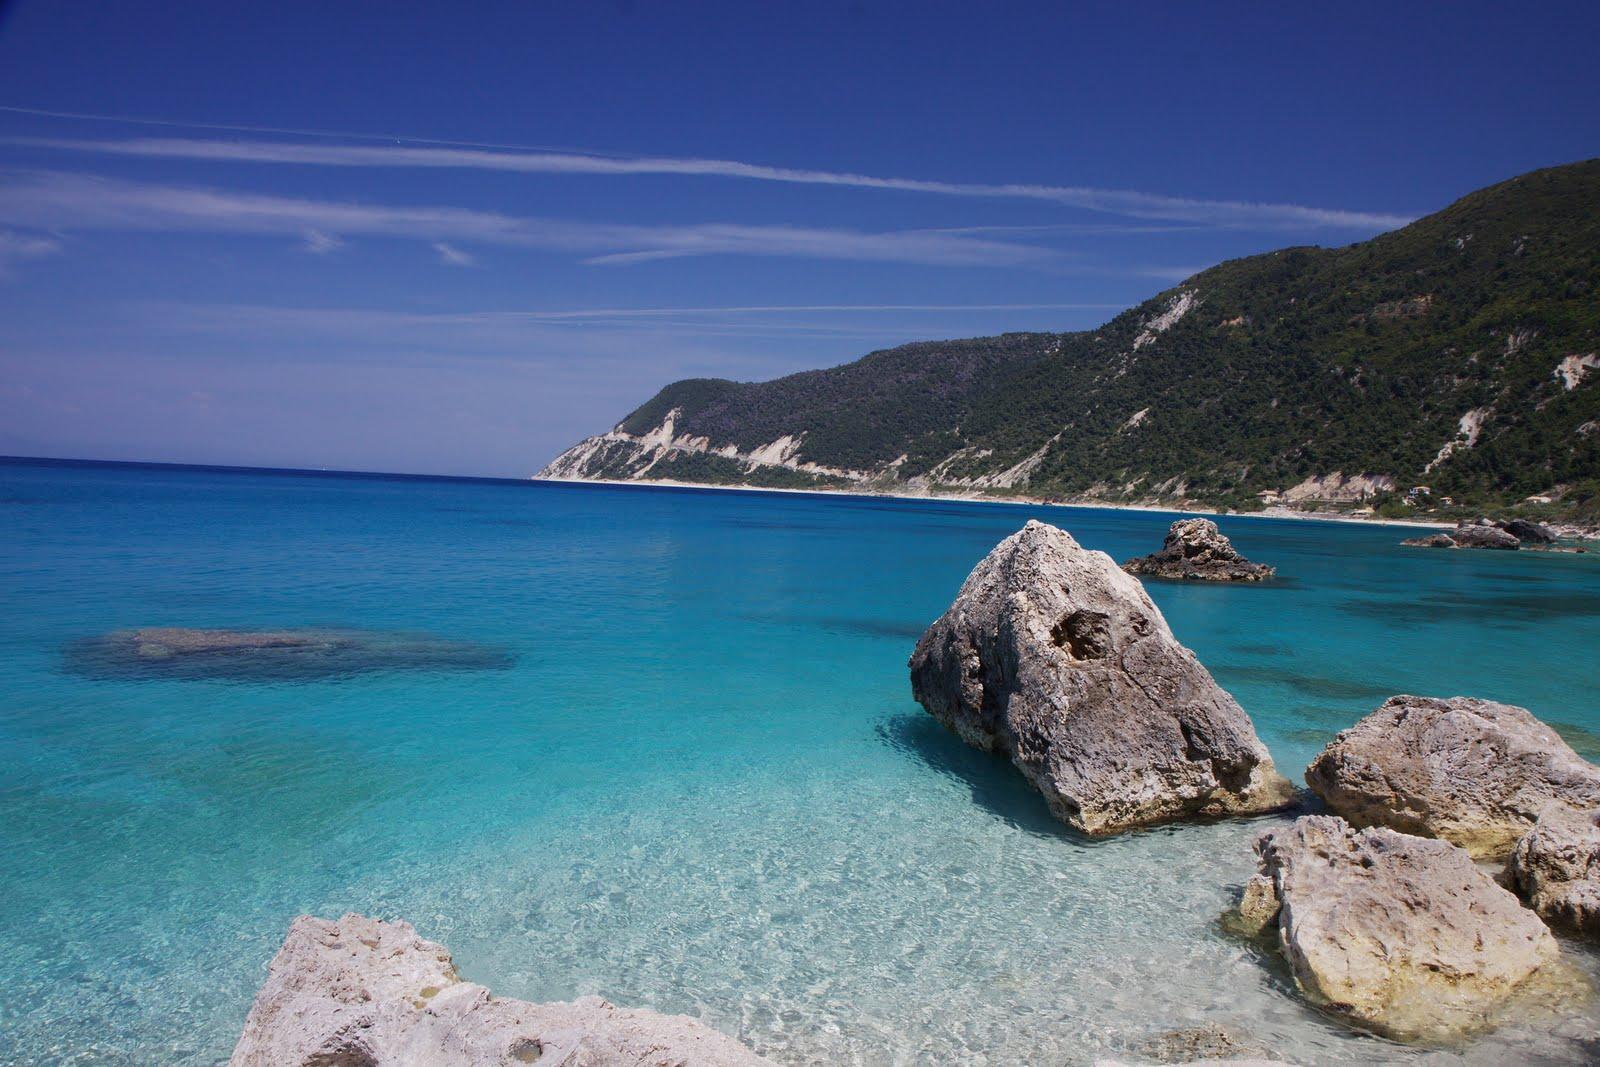 lefkada-beaches-agios-nikitas-beach-rocks